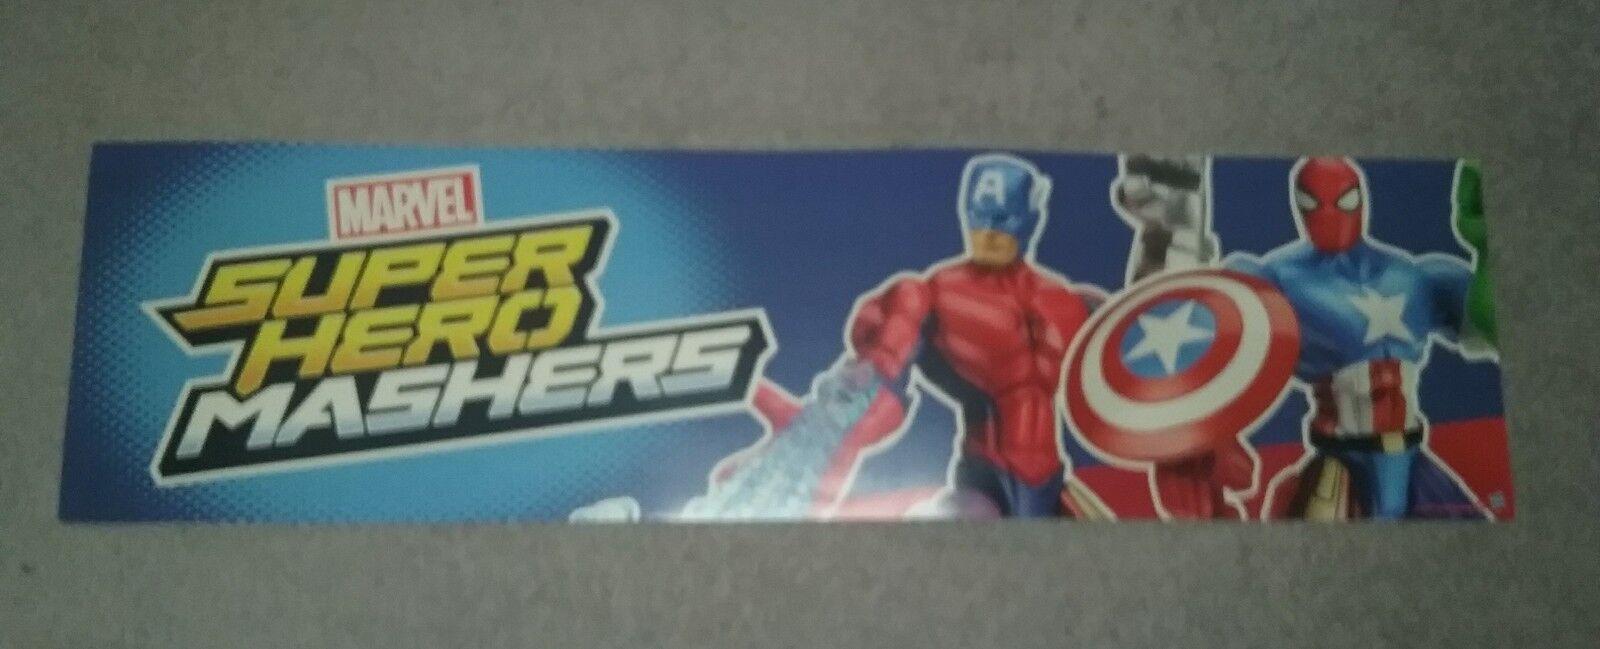 Hasbro Marvel Super Super Super Hero Mashers Store Display d42552